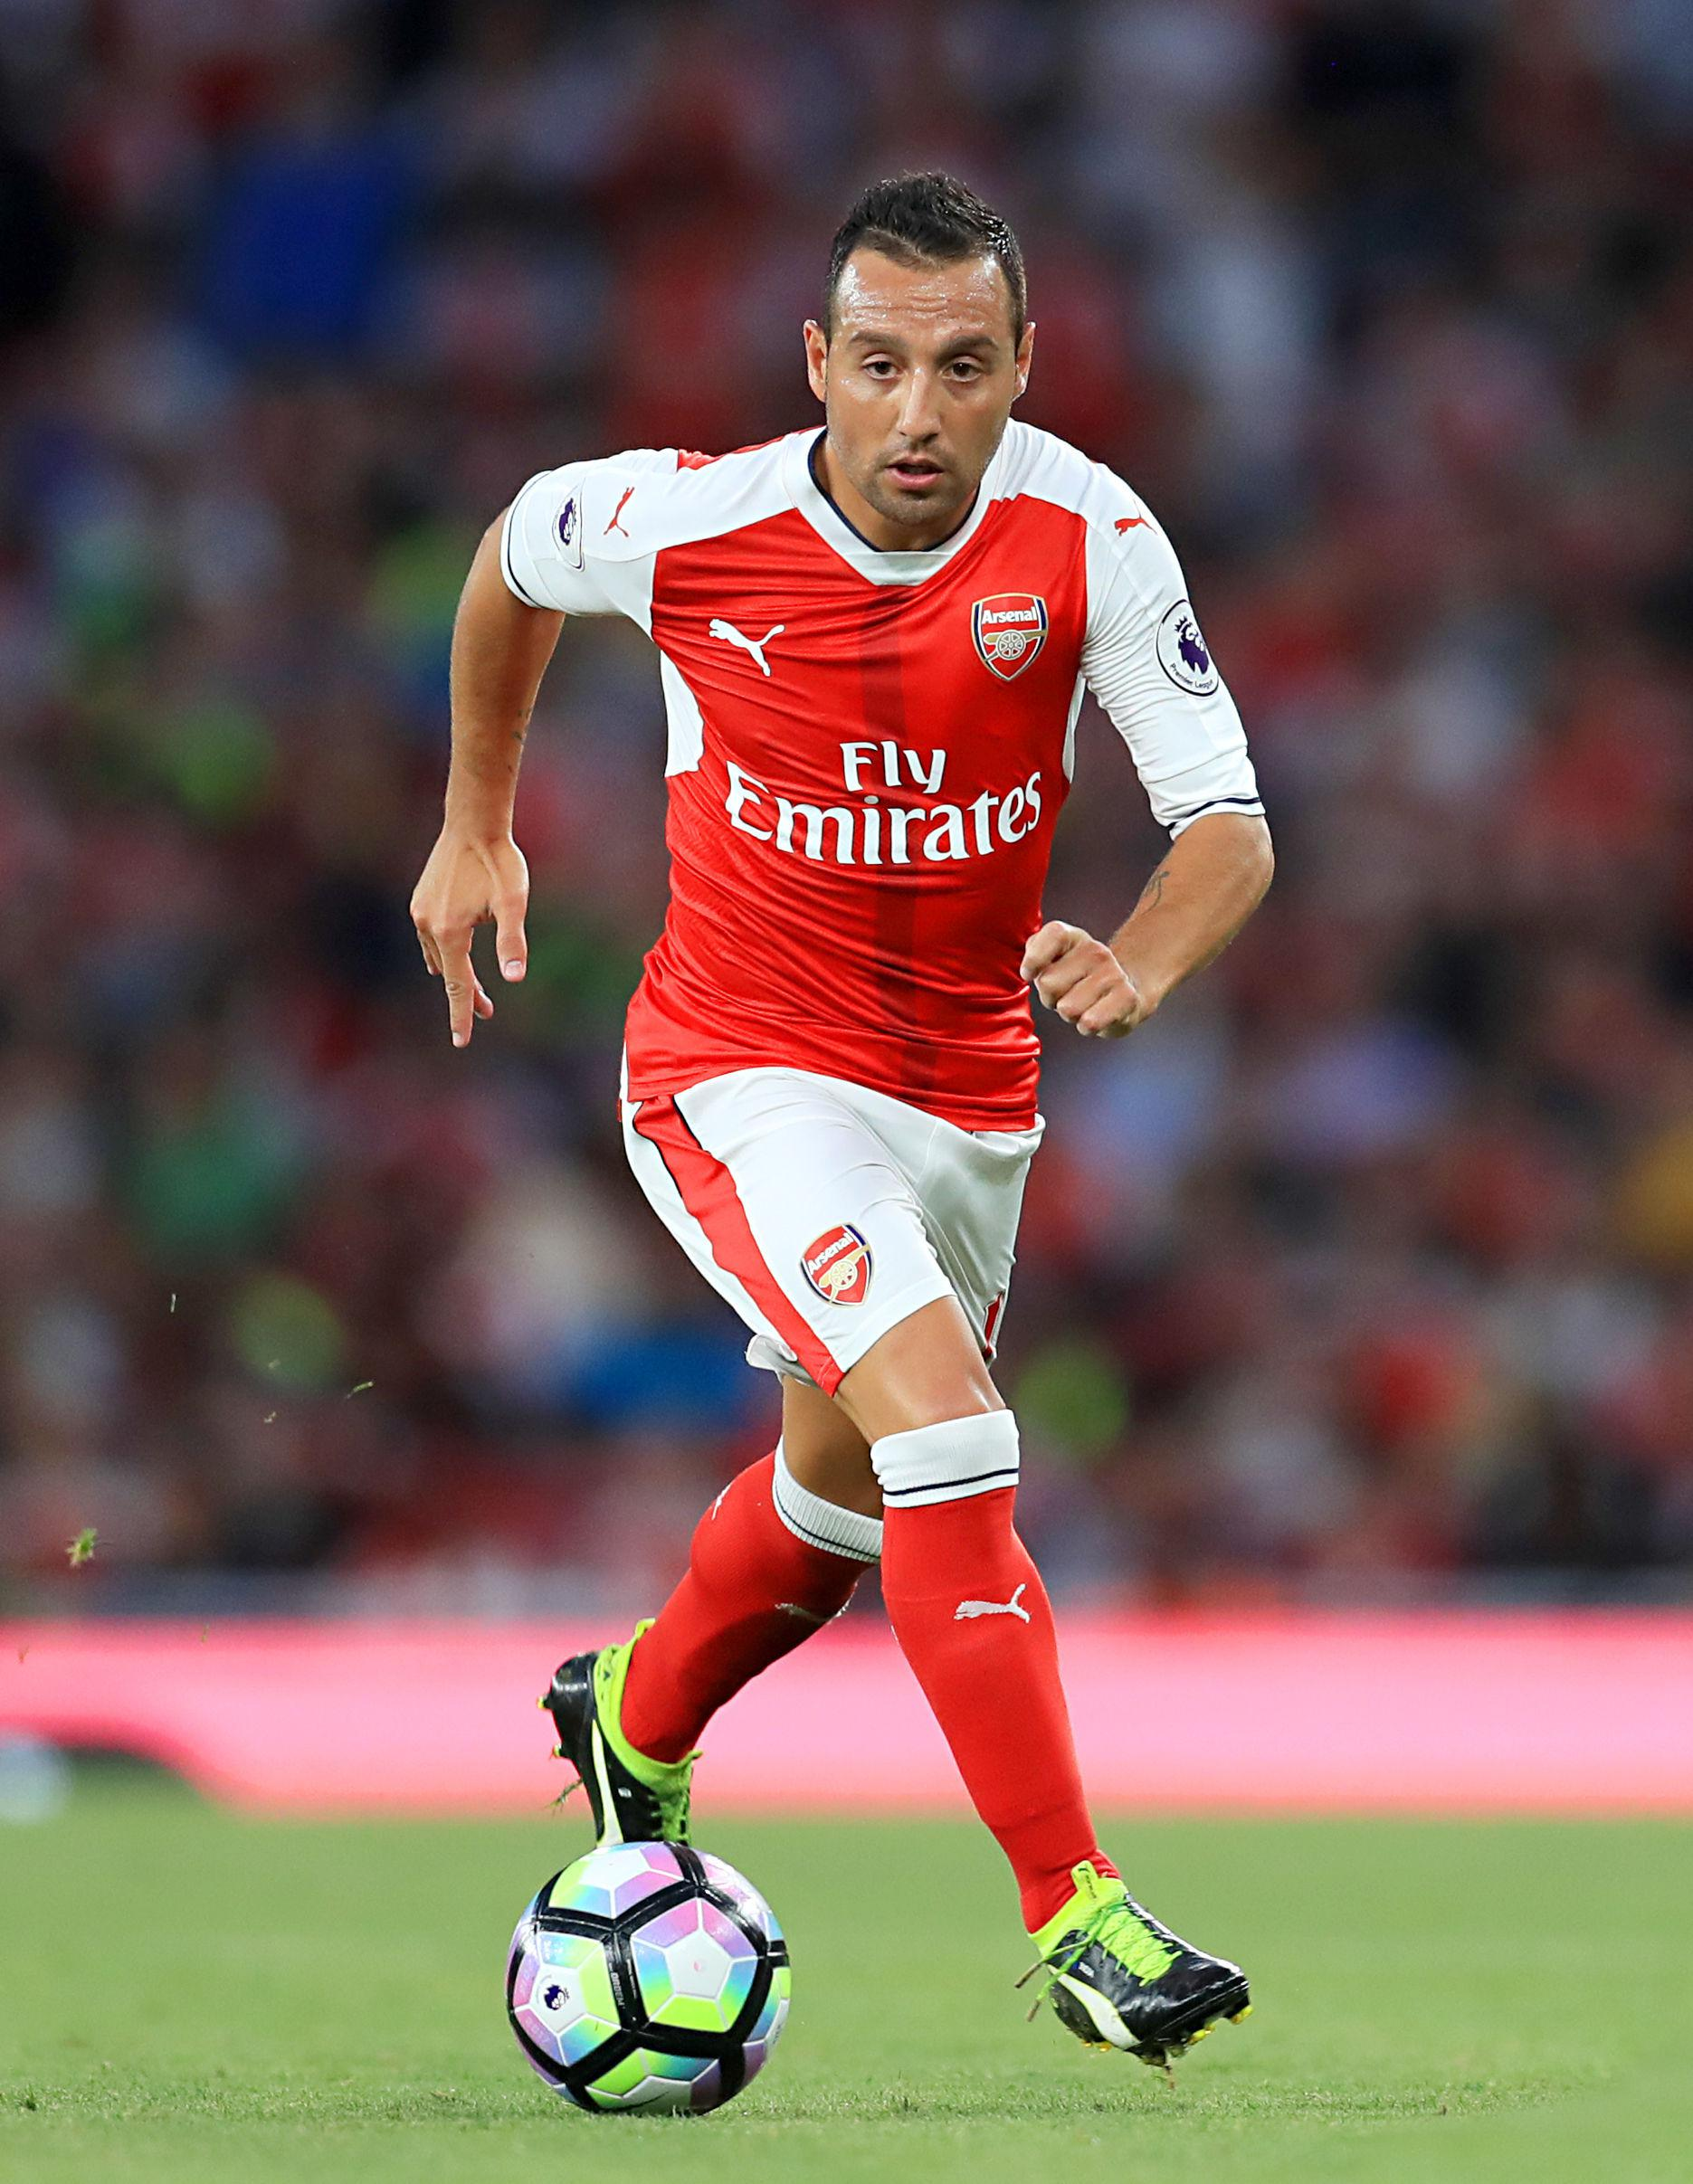 Santi Cazorla has been added to the Europa League squad despite injury horror